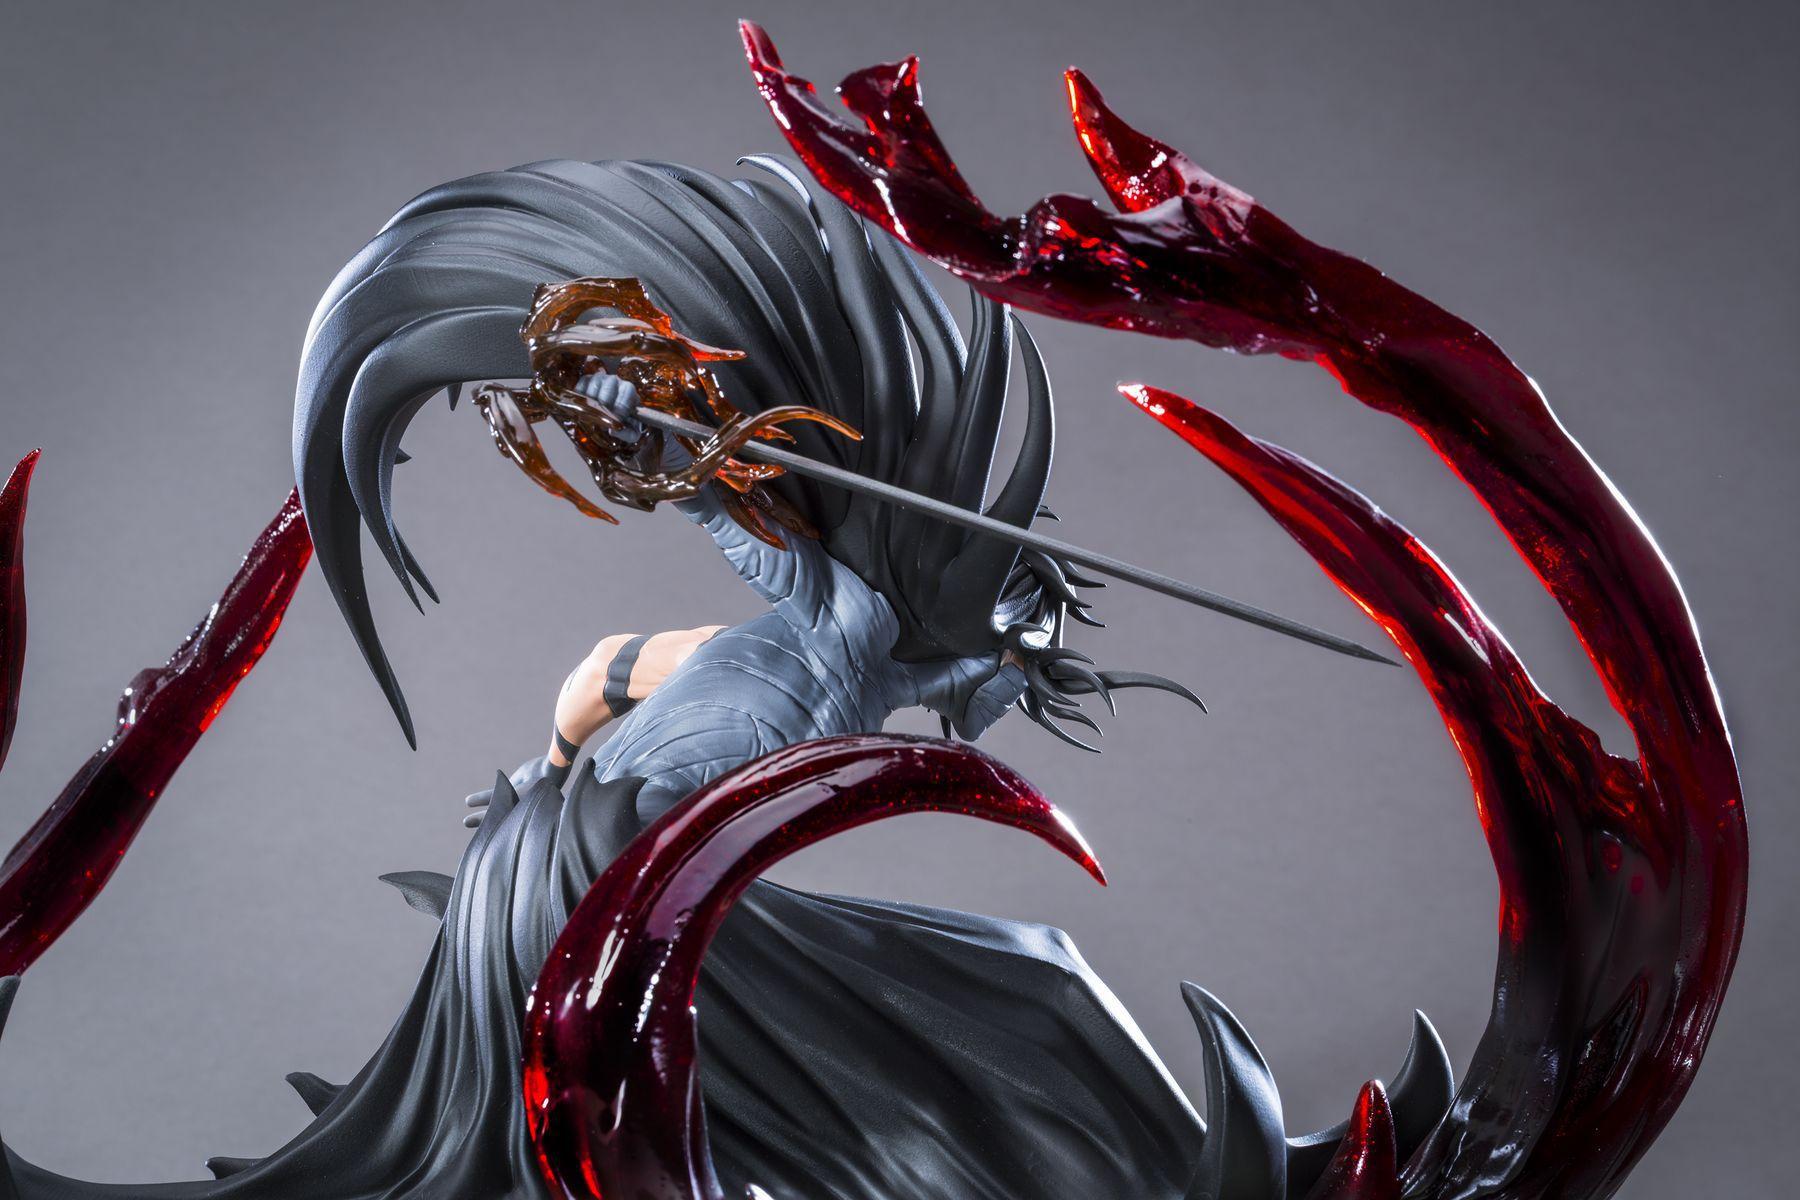 Sculpture Hd Wallpapers Toyzmag Com 187 Tsume Hqs Bleach Ichigo Final Getsuga Tenshou